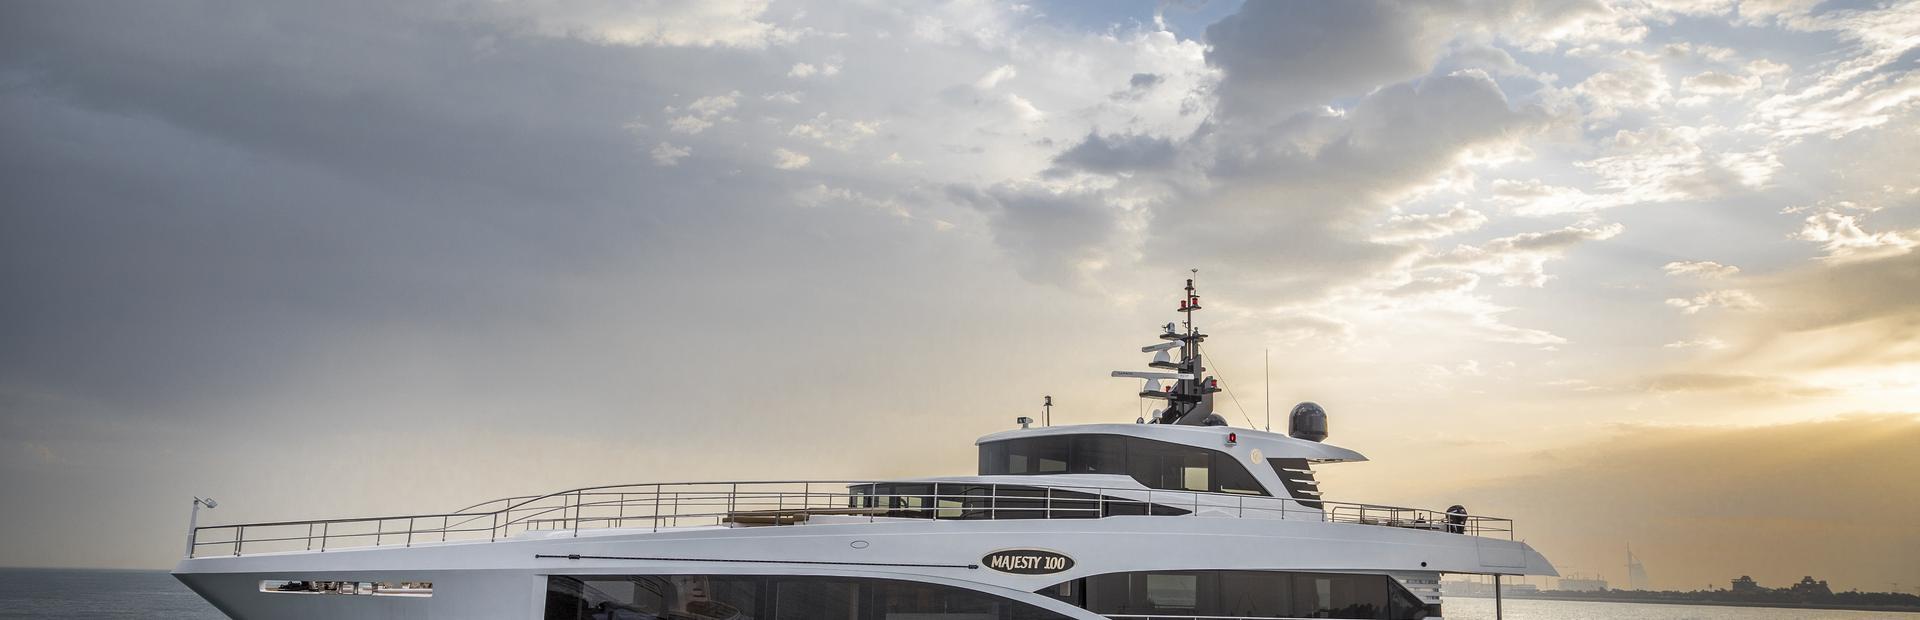 Majesty 100 Yacht Charter